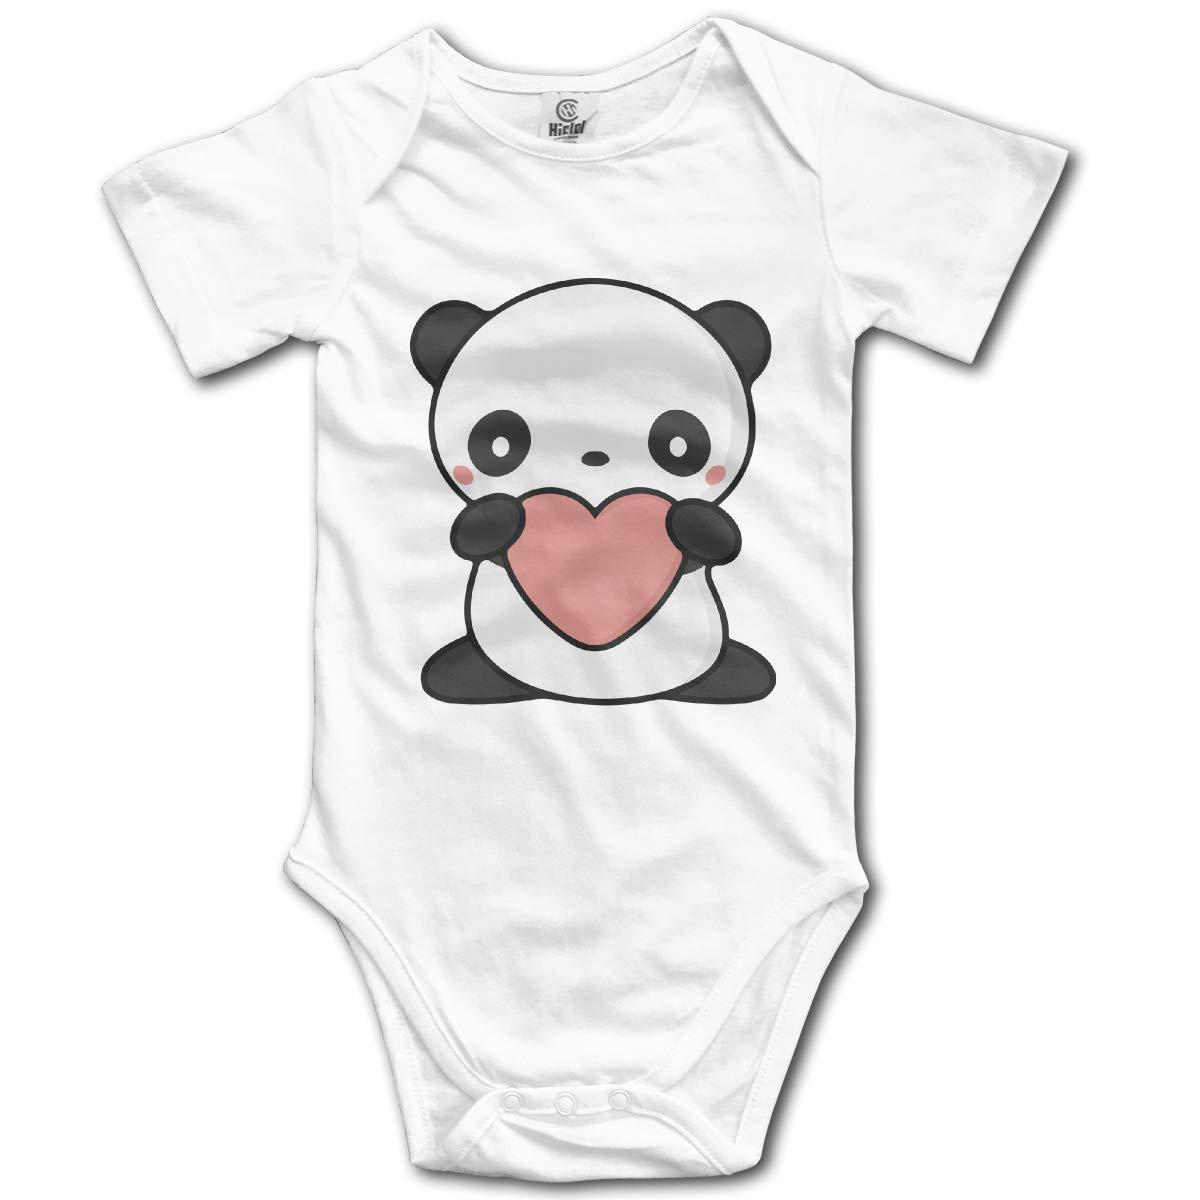 CDHL99 Cute Panda Unisex Solid Baby Short Sleeve Romper Pajamas 0-2T